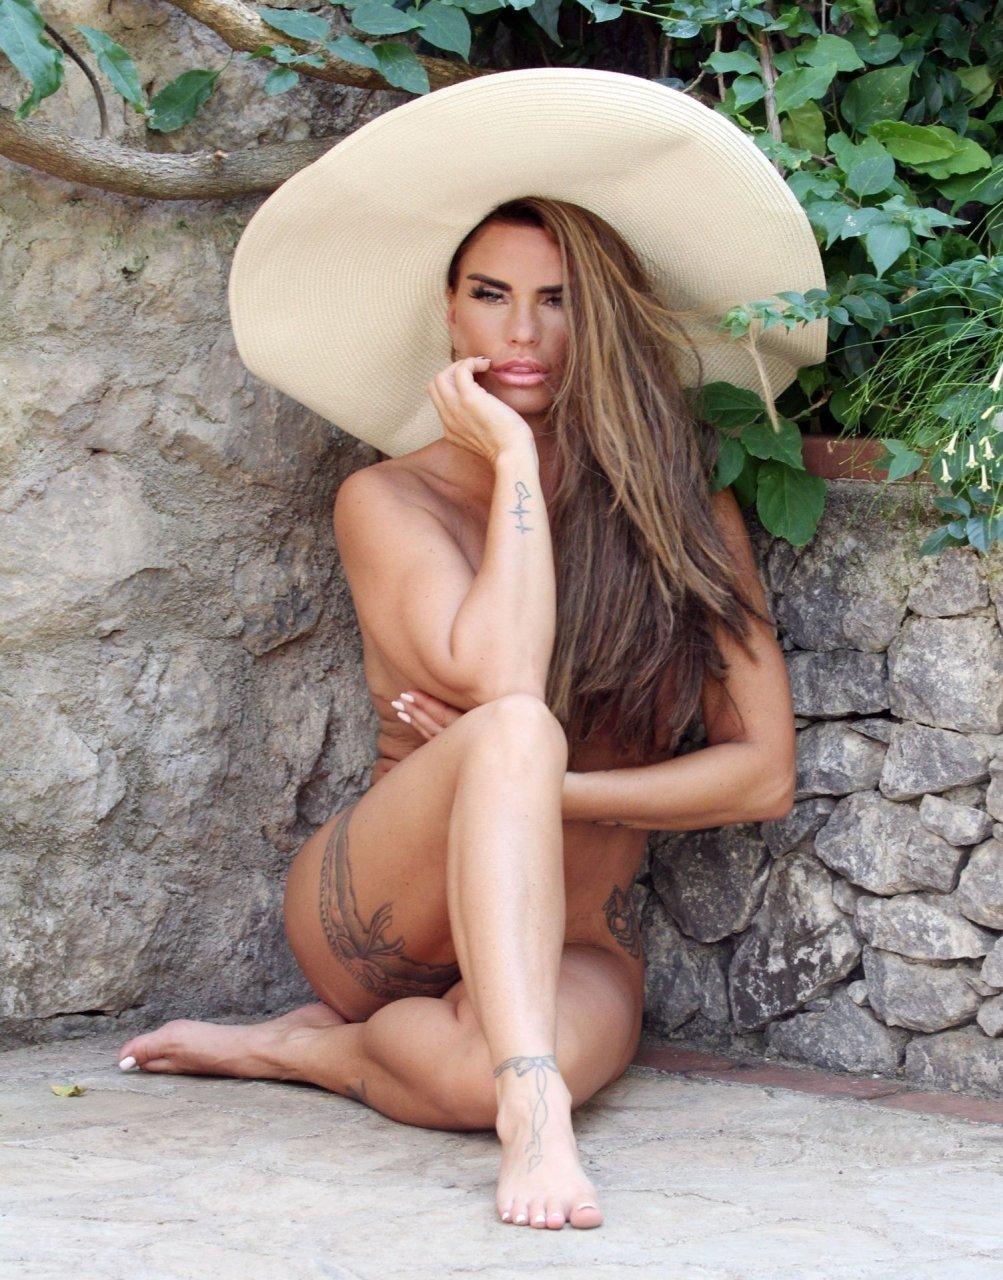 Katie-Price-Nude-Sexy-TheFappeningBlog.com-96.jpg